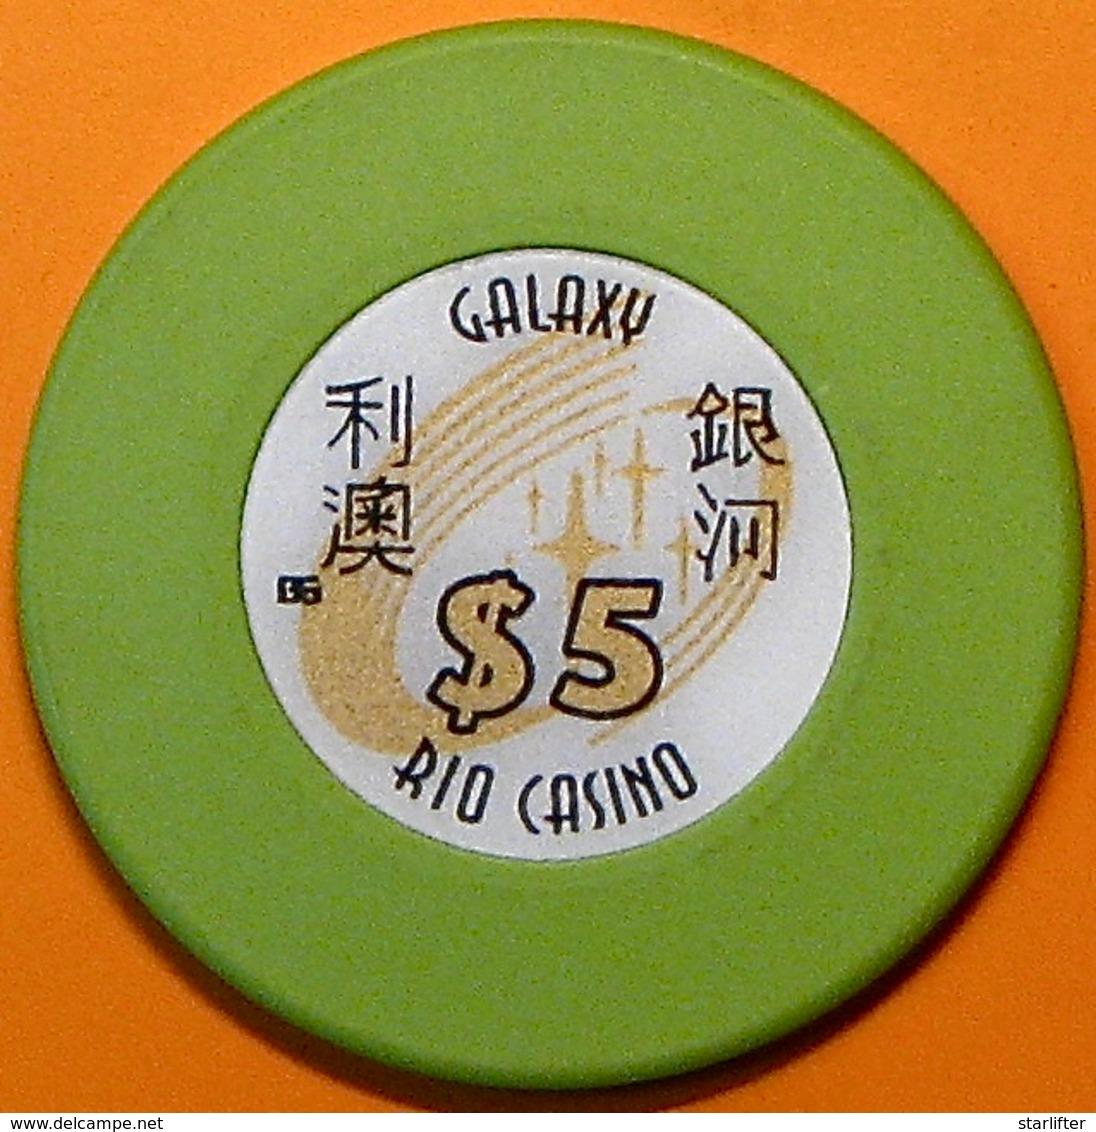 HK$5 Casino Chip. Galaxy Rio, Macau. N40. - Casino